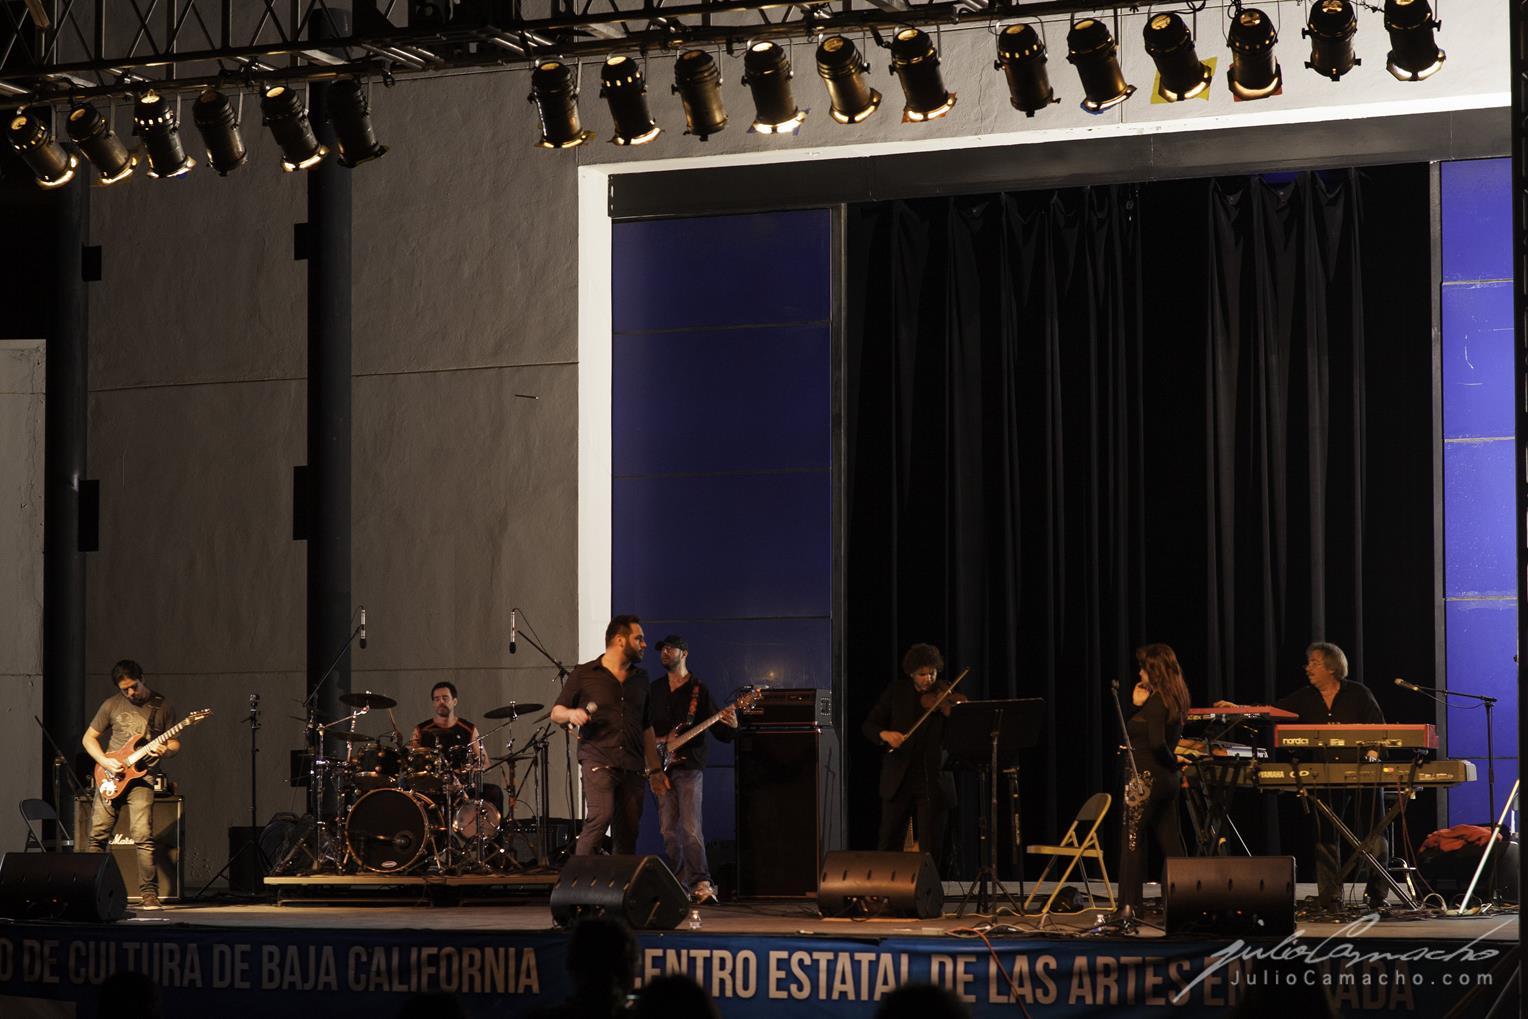 2014-10-30 31 CAST TOUR Ensenada y Tijuana - 0946 - www.Juli (Copy).jpg